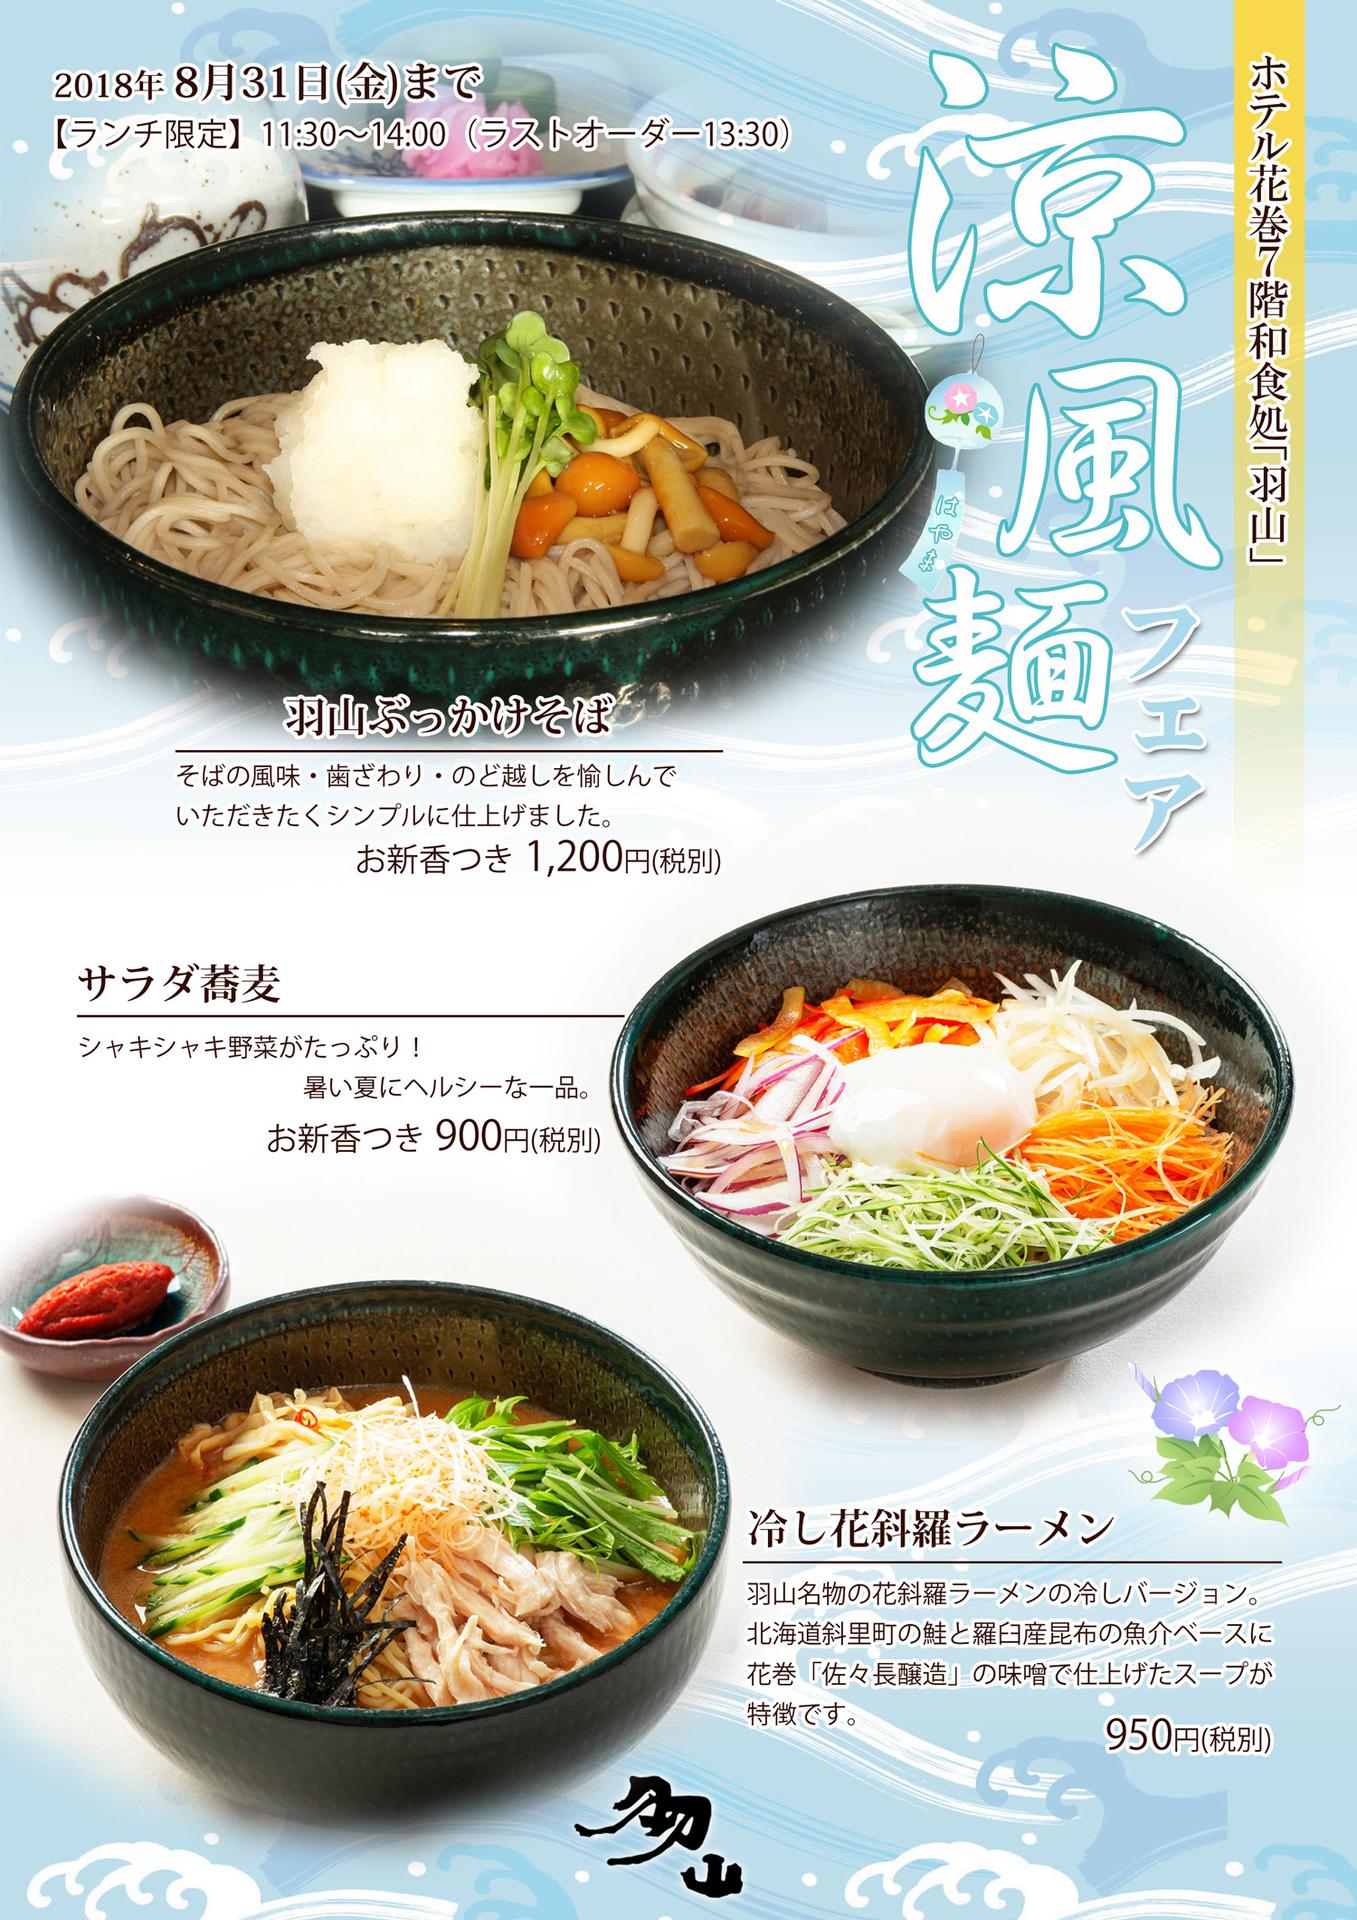 20180708_涼風麺フェア(羽山)2018_修正版.jpg